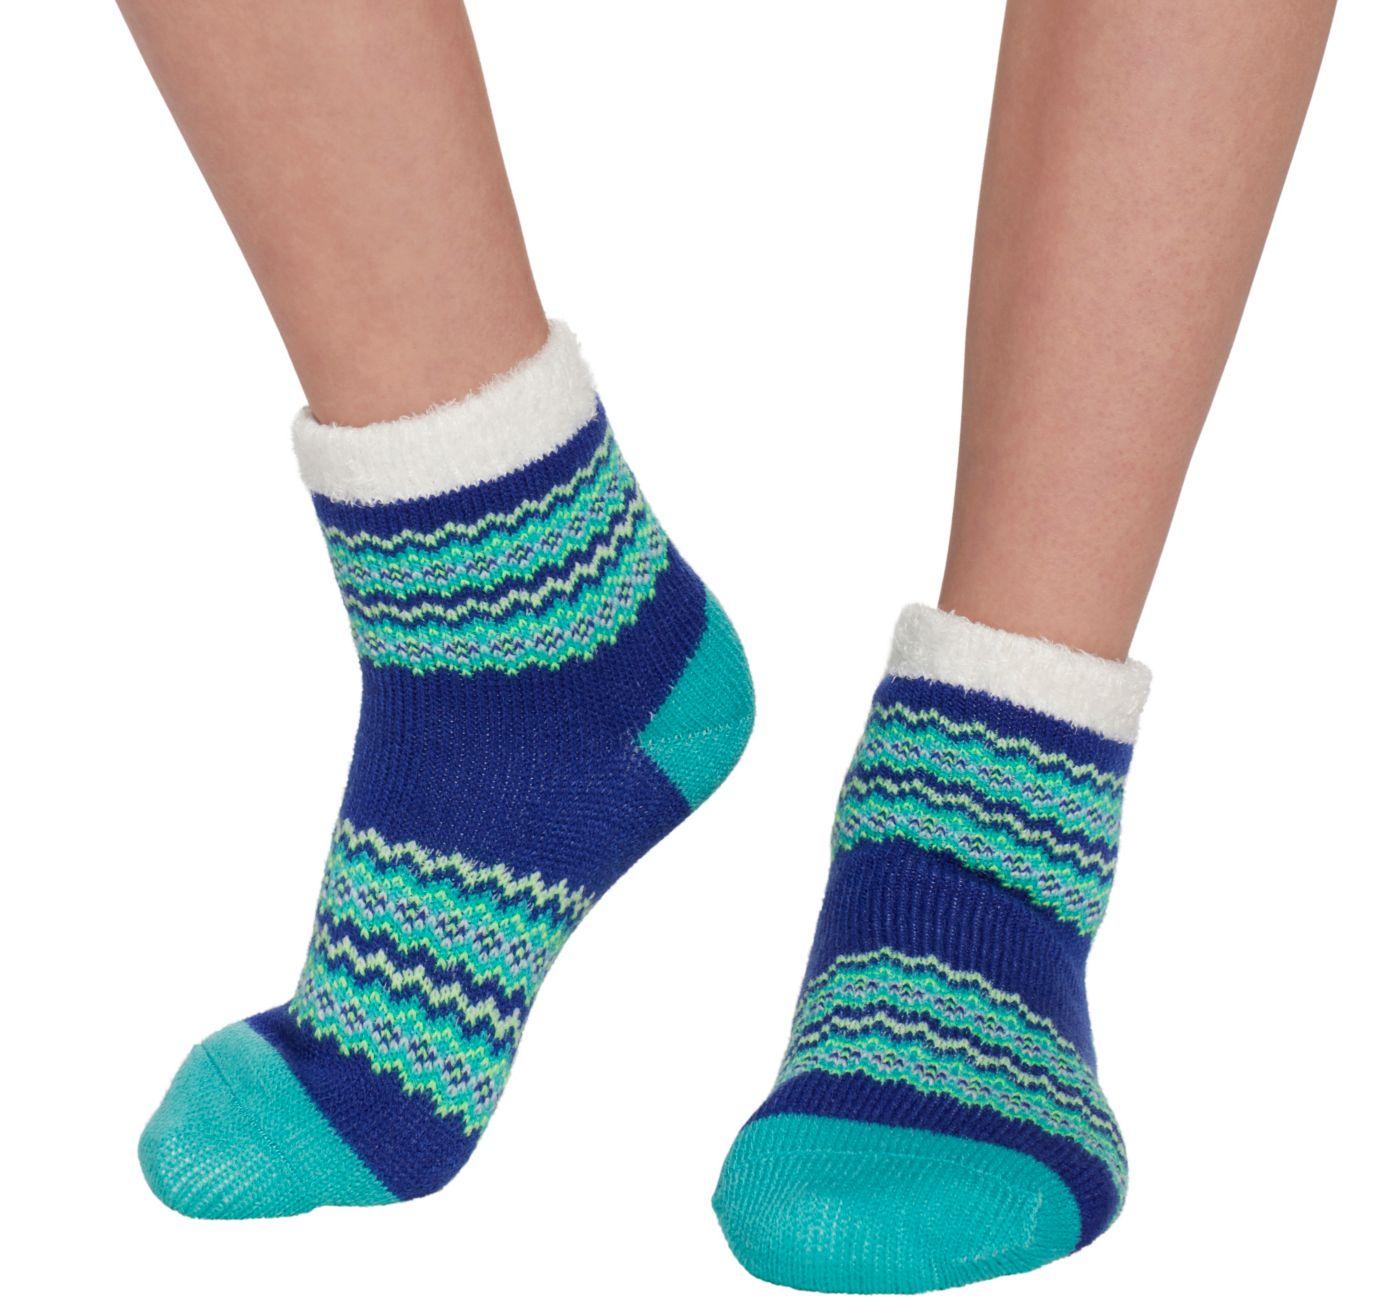 Field & Stream Girls' Cozy Cabin Tribal Crew Socks